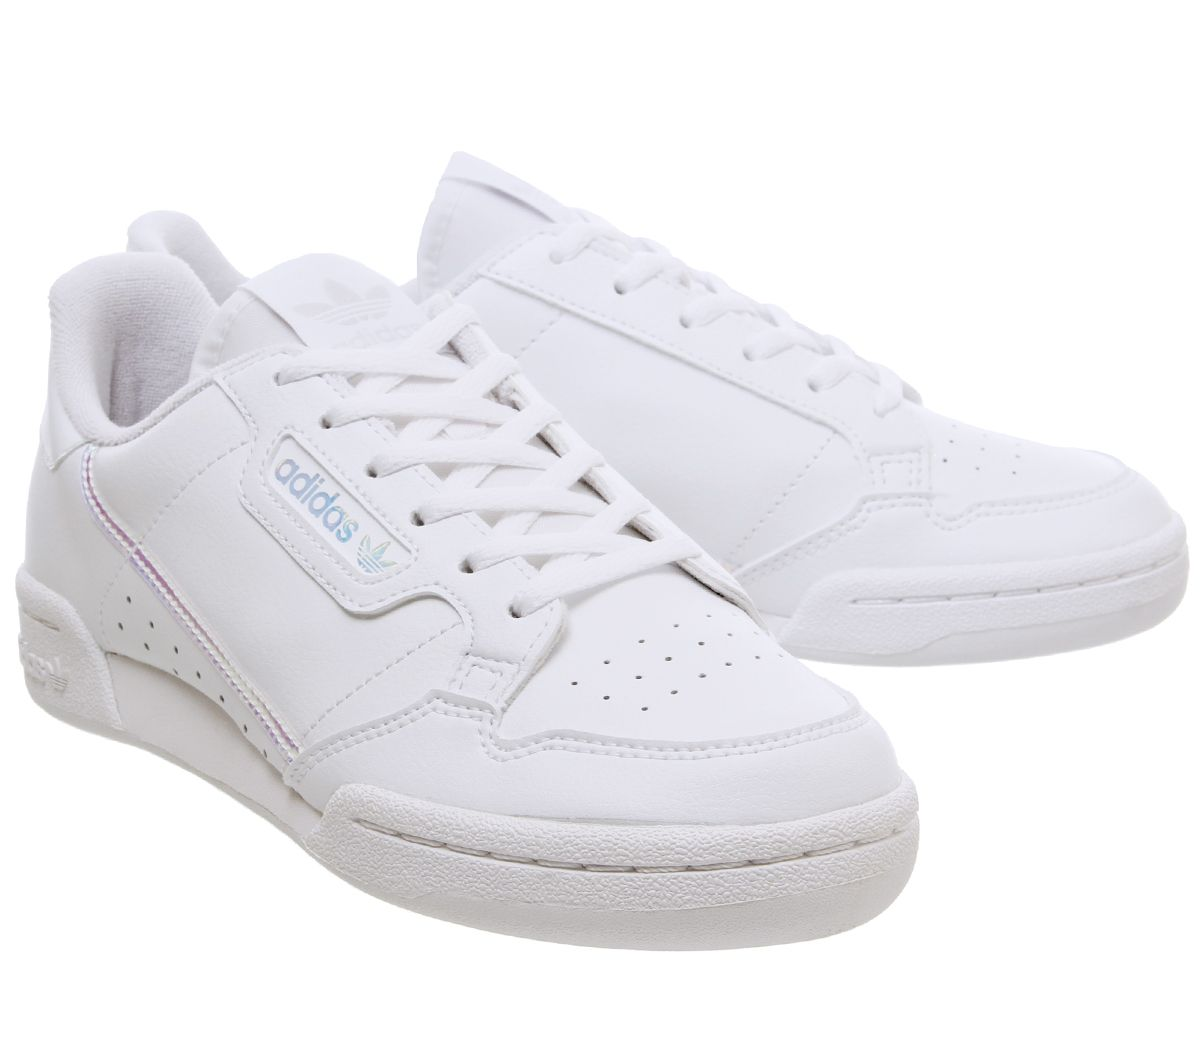 Bambini-Adidas-Continental-anni-039-80-JNR-Scarpe-da-ginnastica-bianco-iridescente-Kids miniatura 6